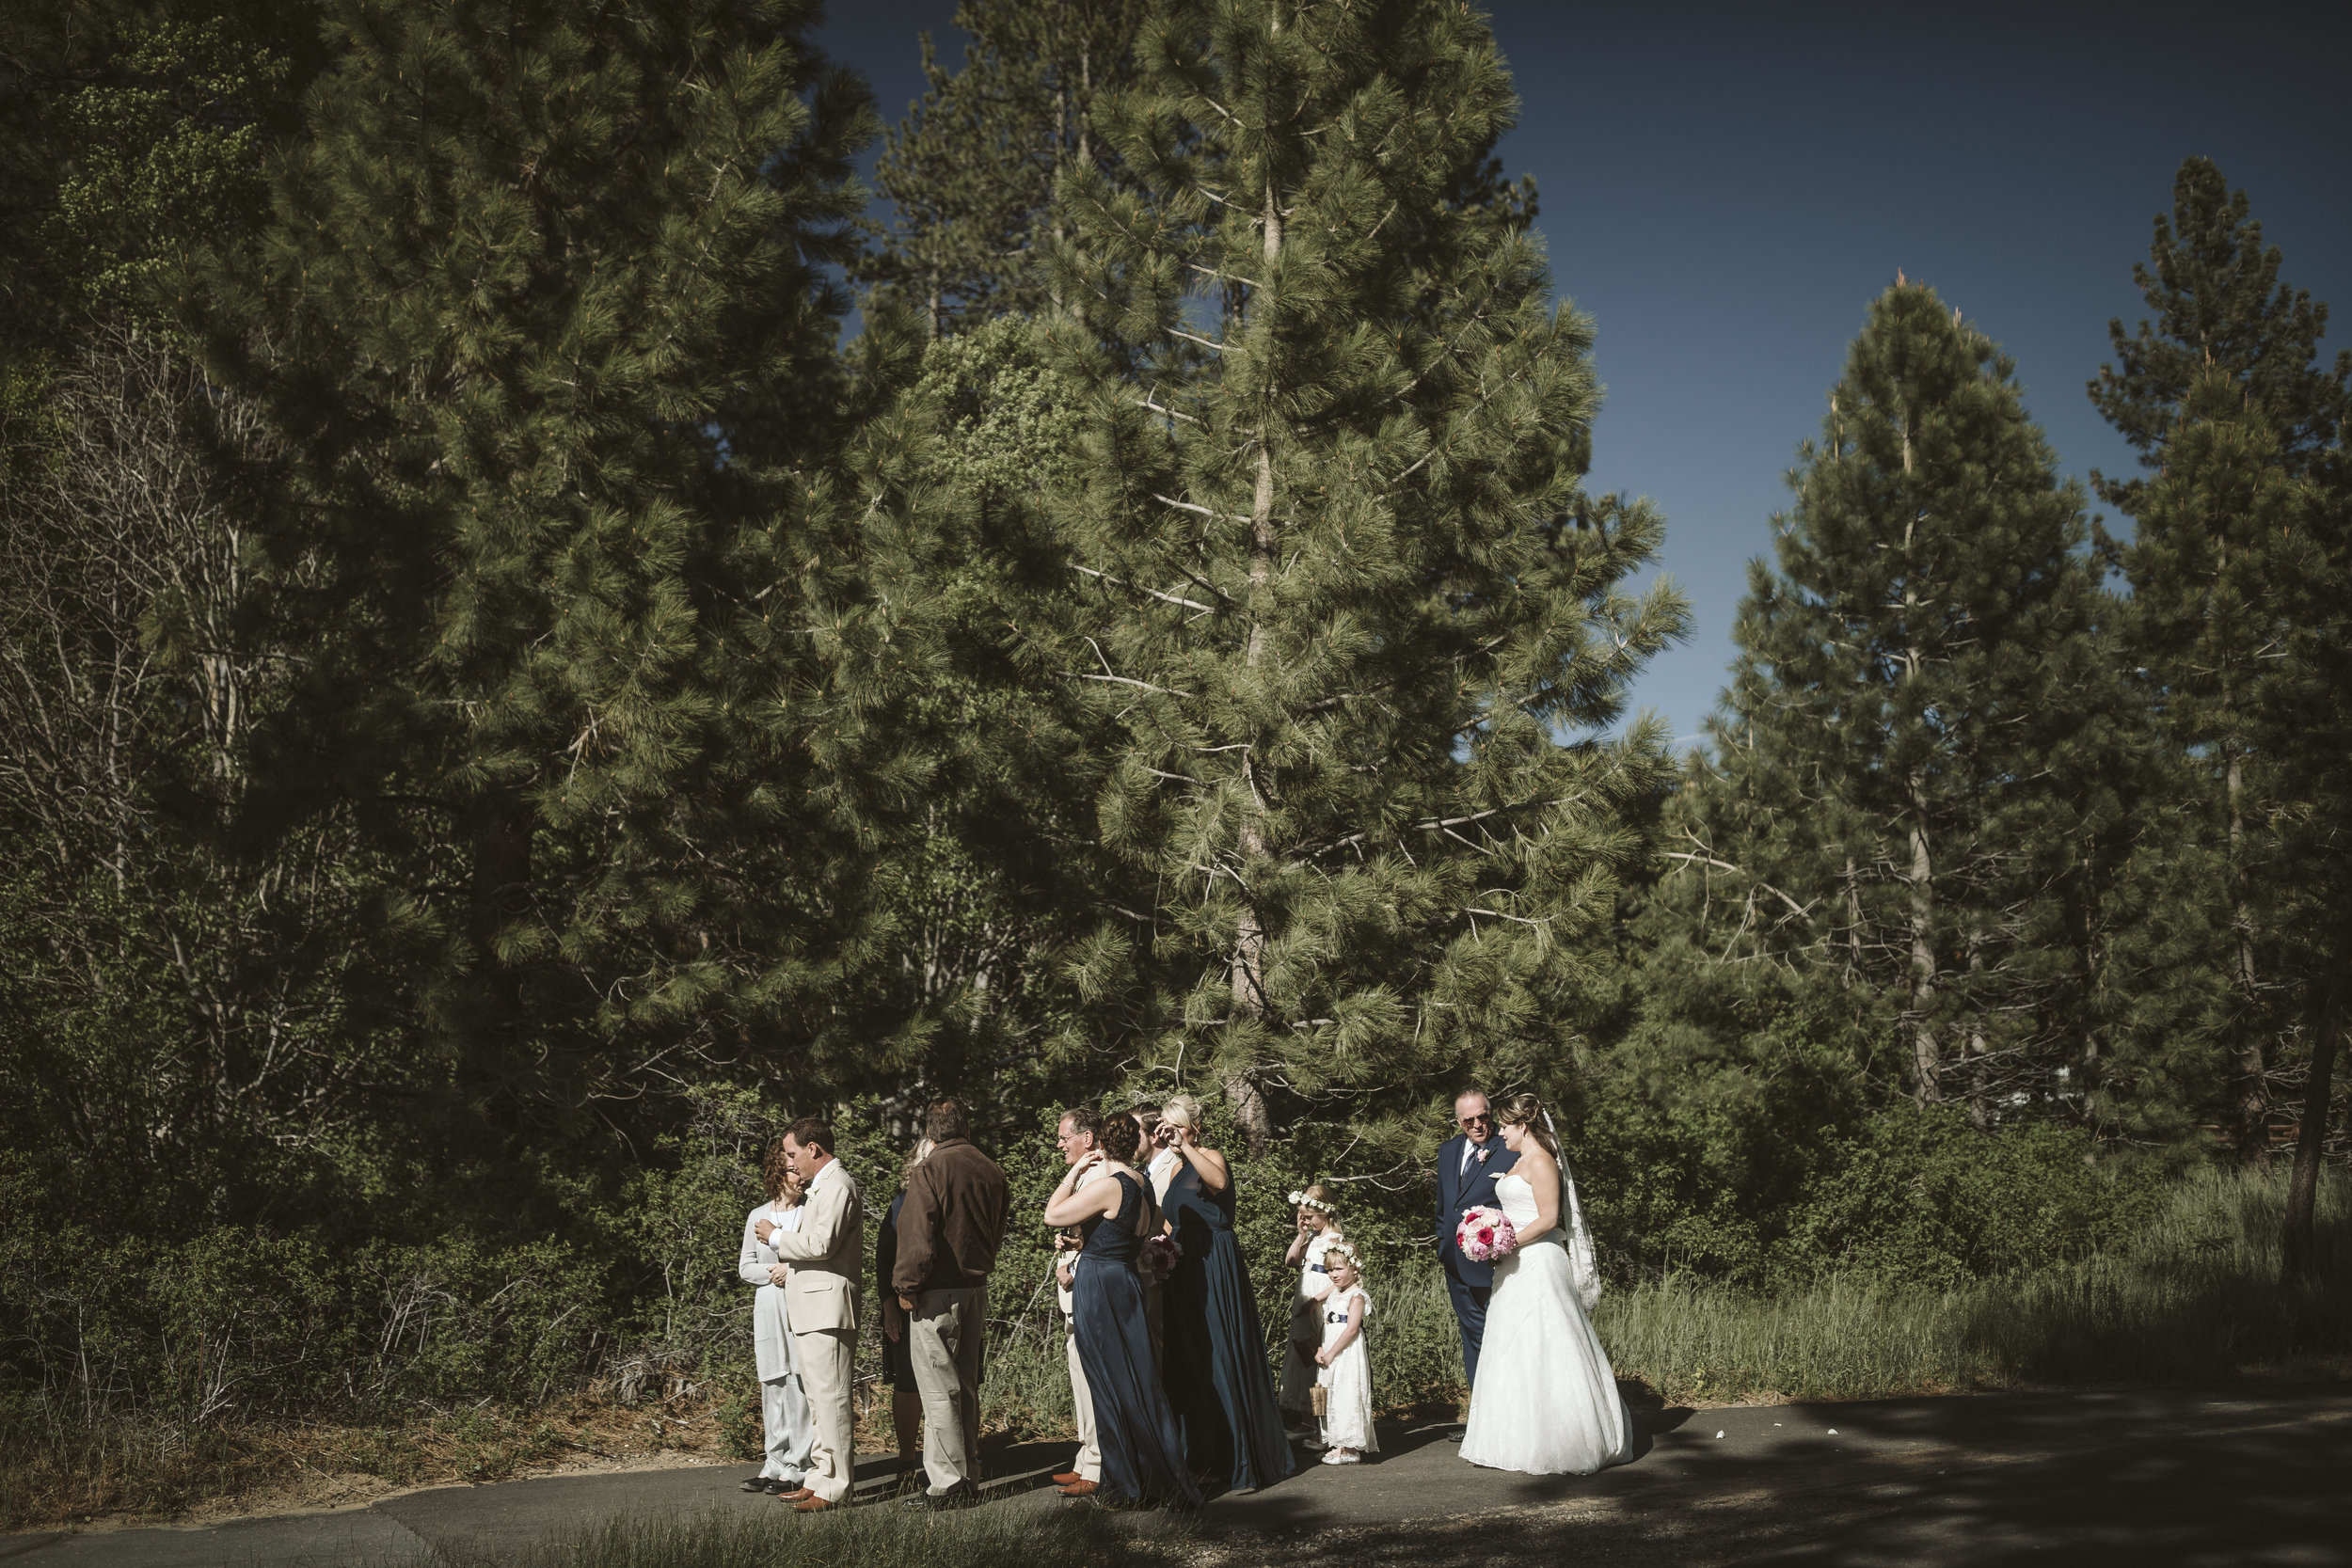 0M7A1254vildphotography-adventurewedding-tahoe-laketahoewedding-laketahoeweddingphotographer-tahoewedding-jamie-ed.jpg